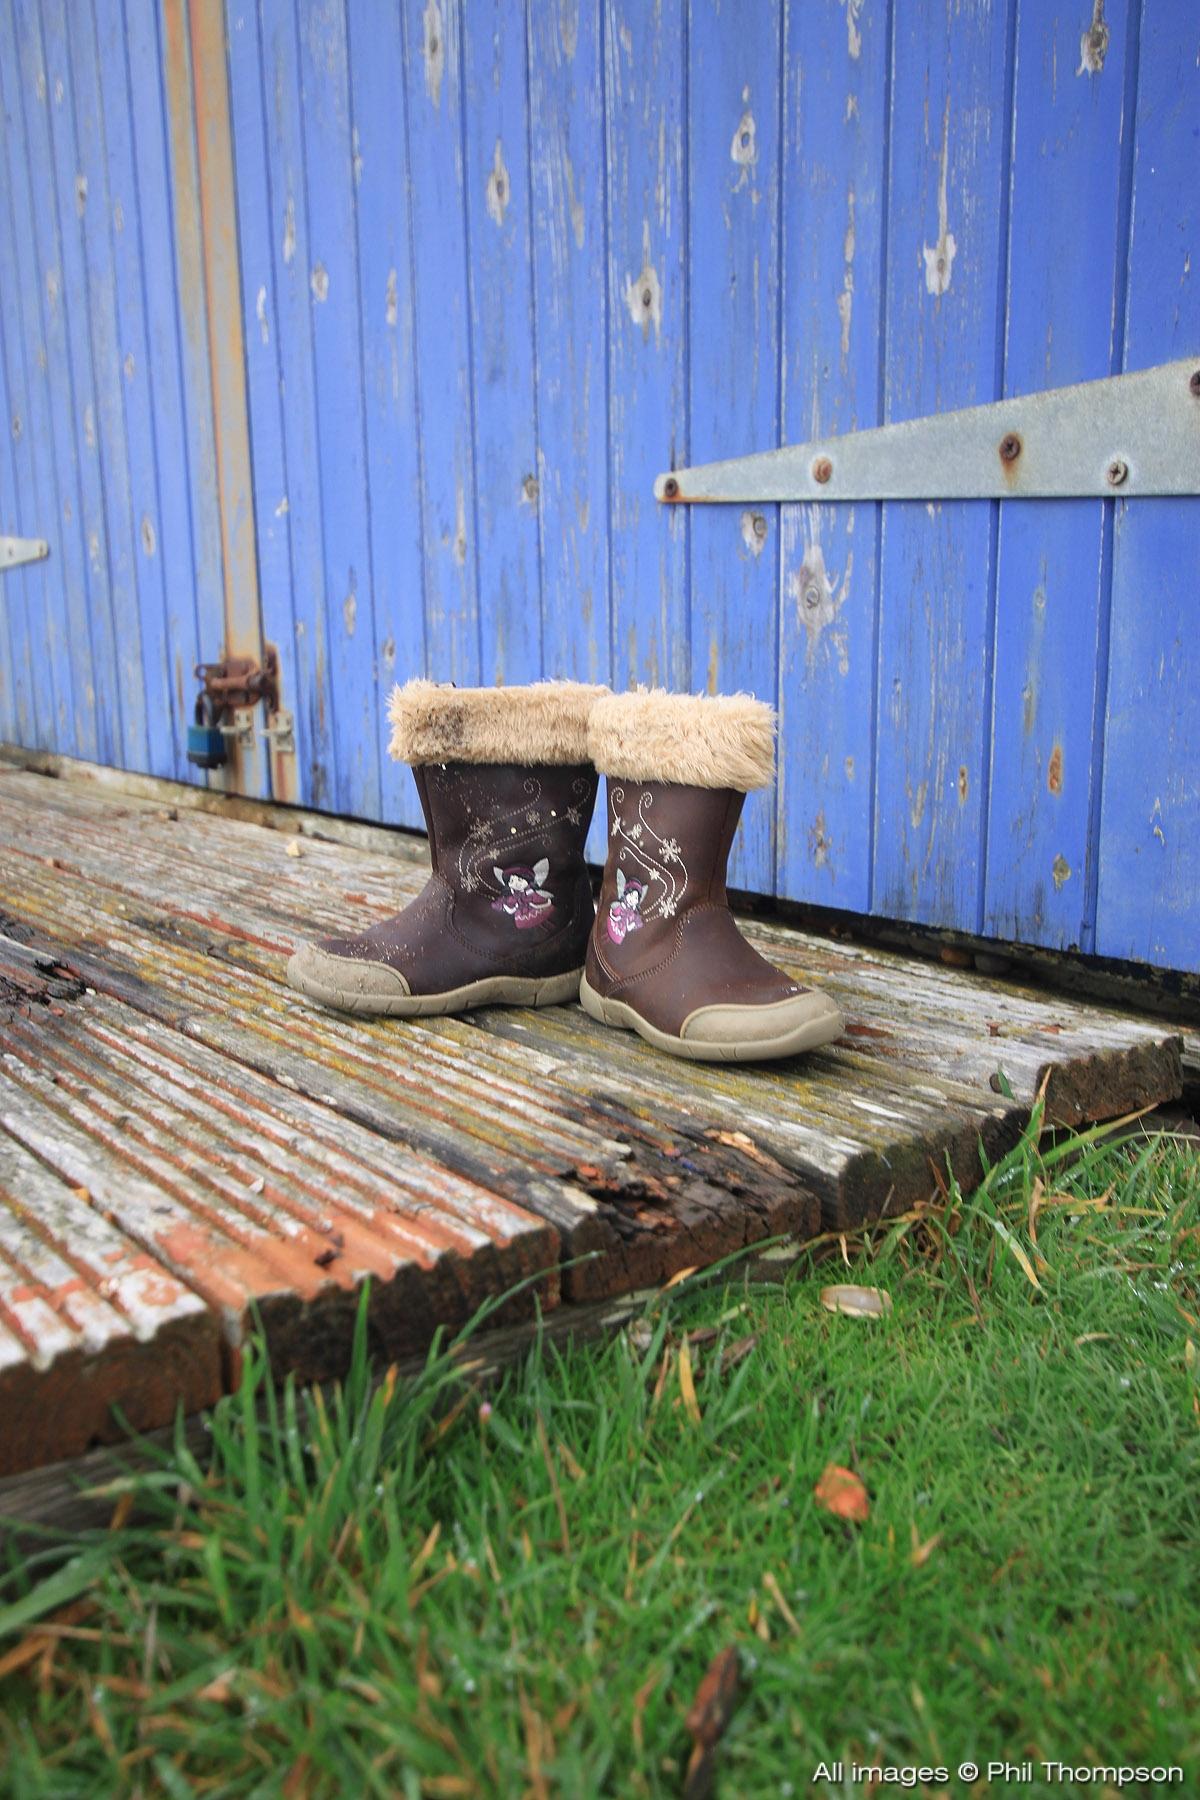 IMG 8933 - beach hut boots